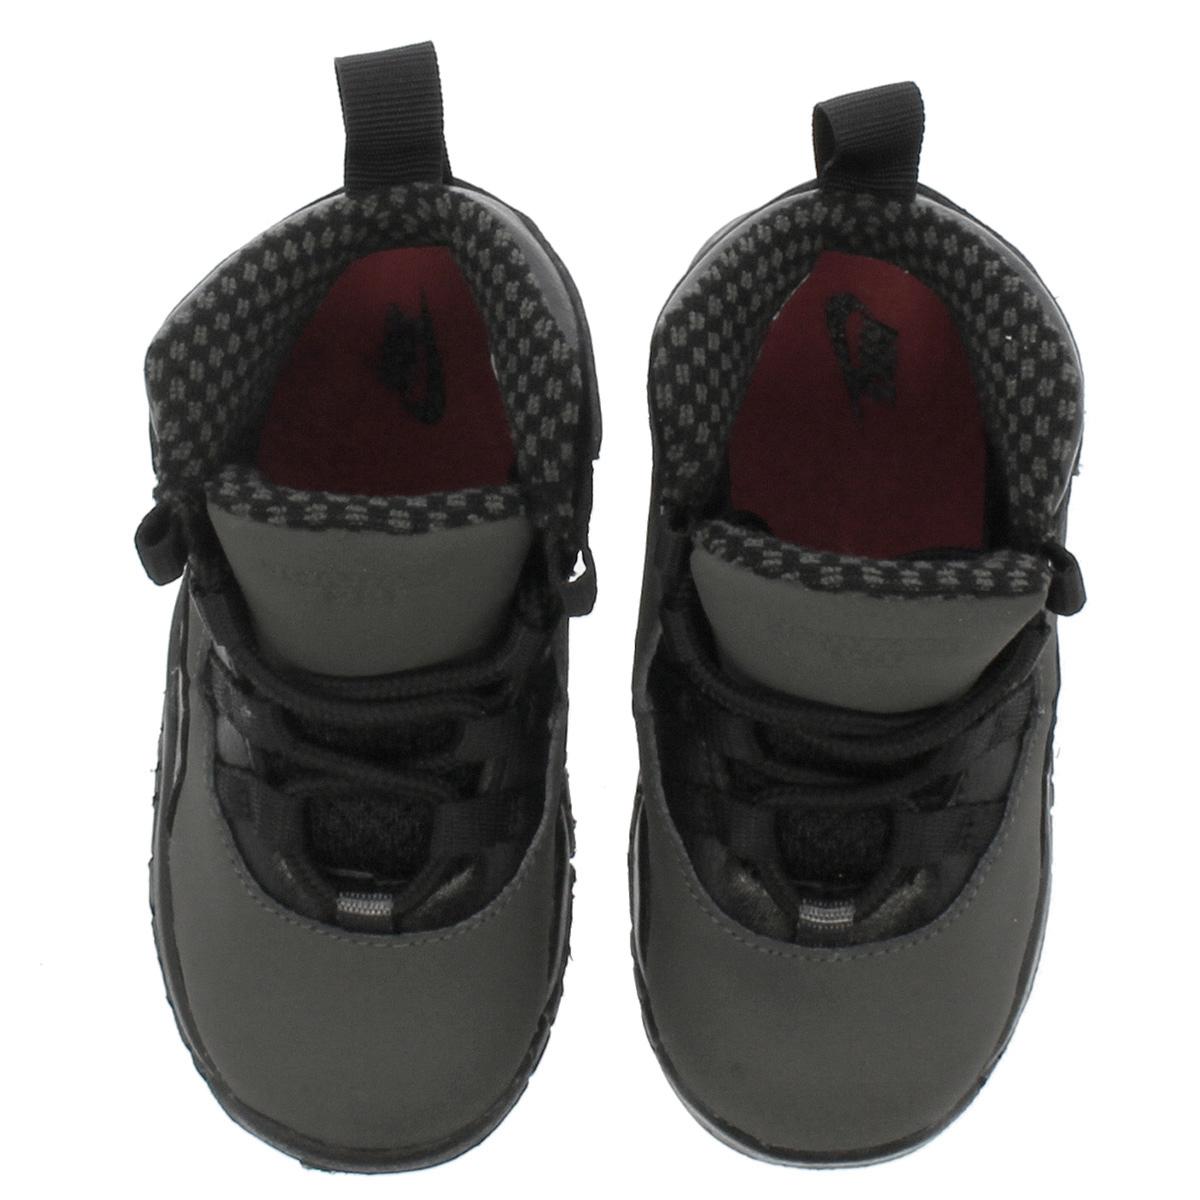 buy online 90d40 a3e69 NIKE AIR JORDAN 10 RETRO BT Nike Air Jordan 10 nostalgic BT DARK  SHADOW/TRUE RED/BLACK 310,808-002